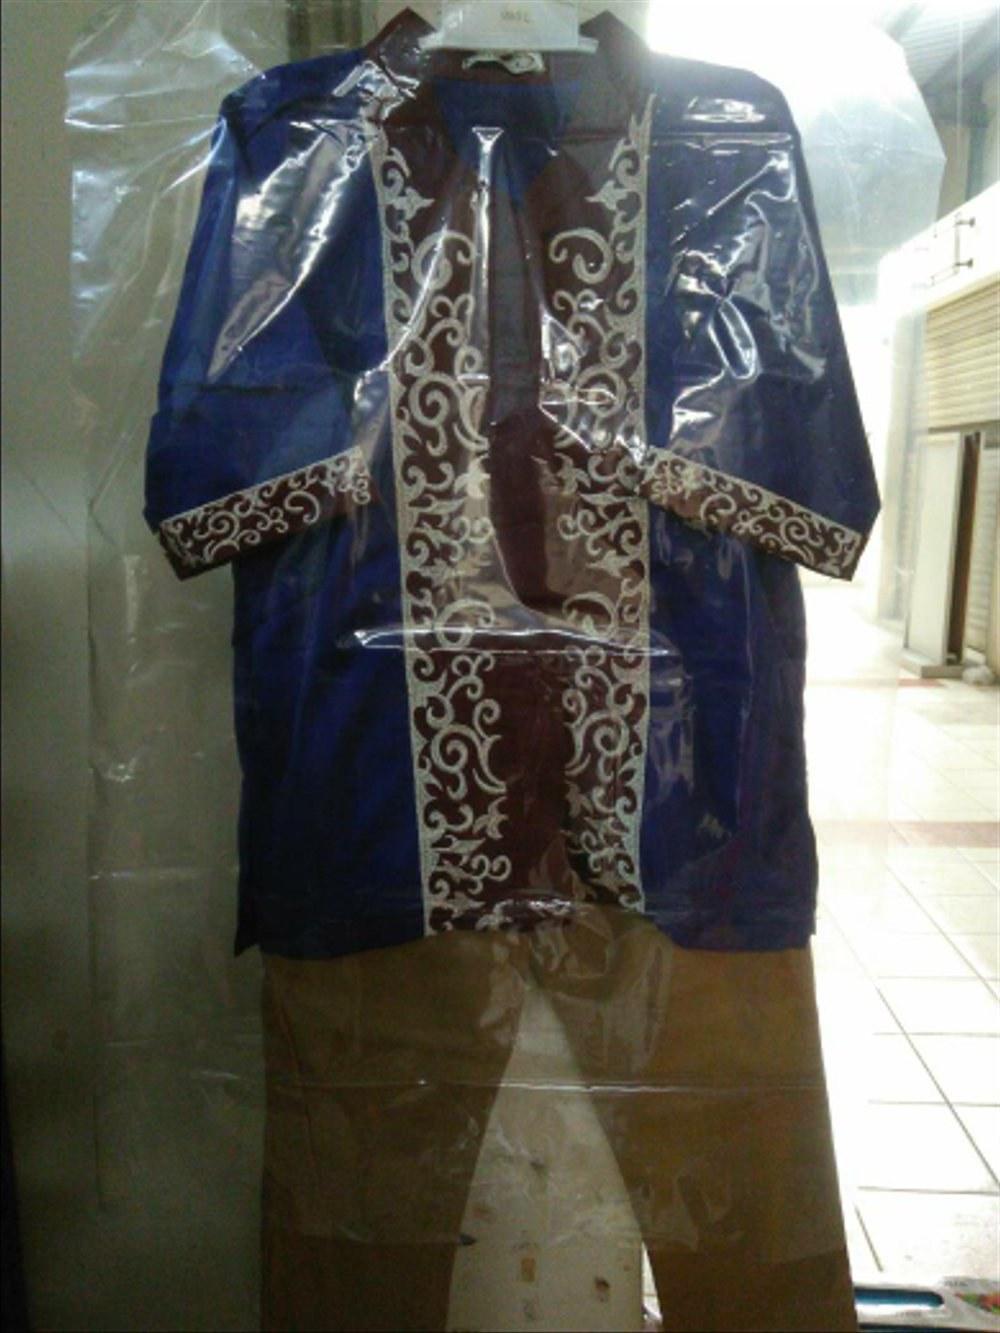 Ide Baju Lebaran Untuk Laki Laki Bqdd Jual Baju Muslim Lebaran Anak Laki Laki Di Lapak Kdsshop